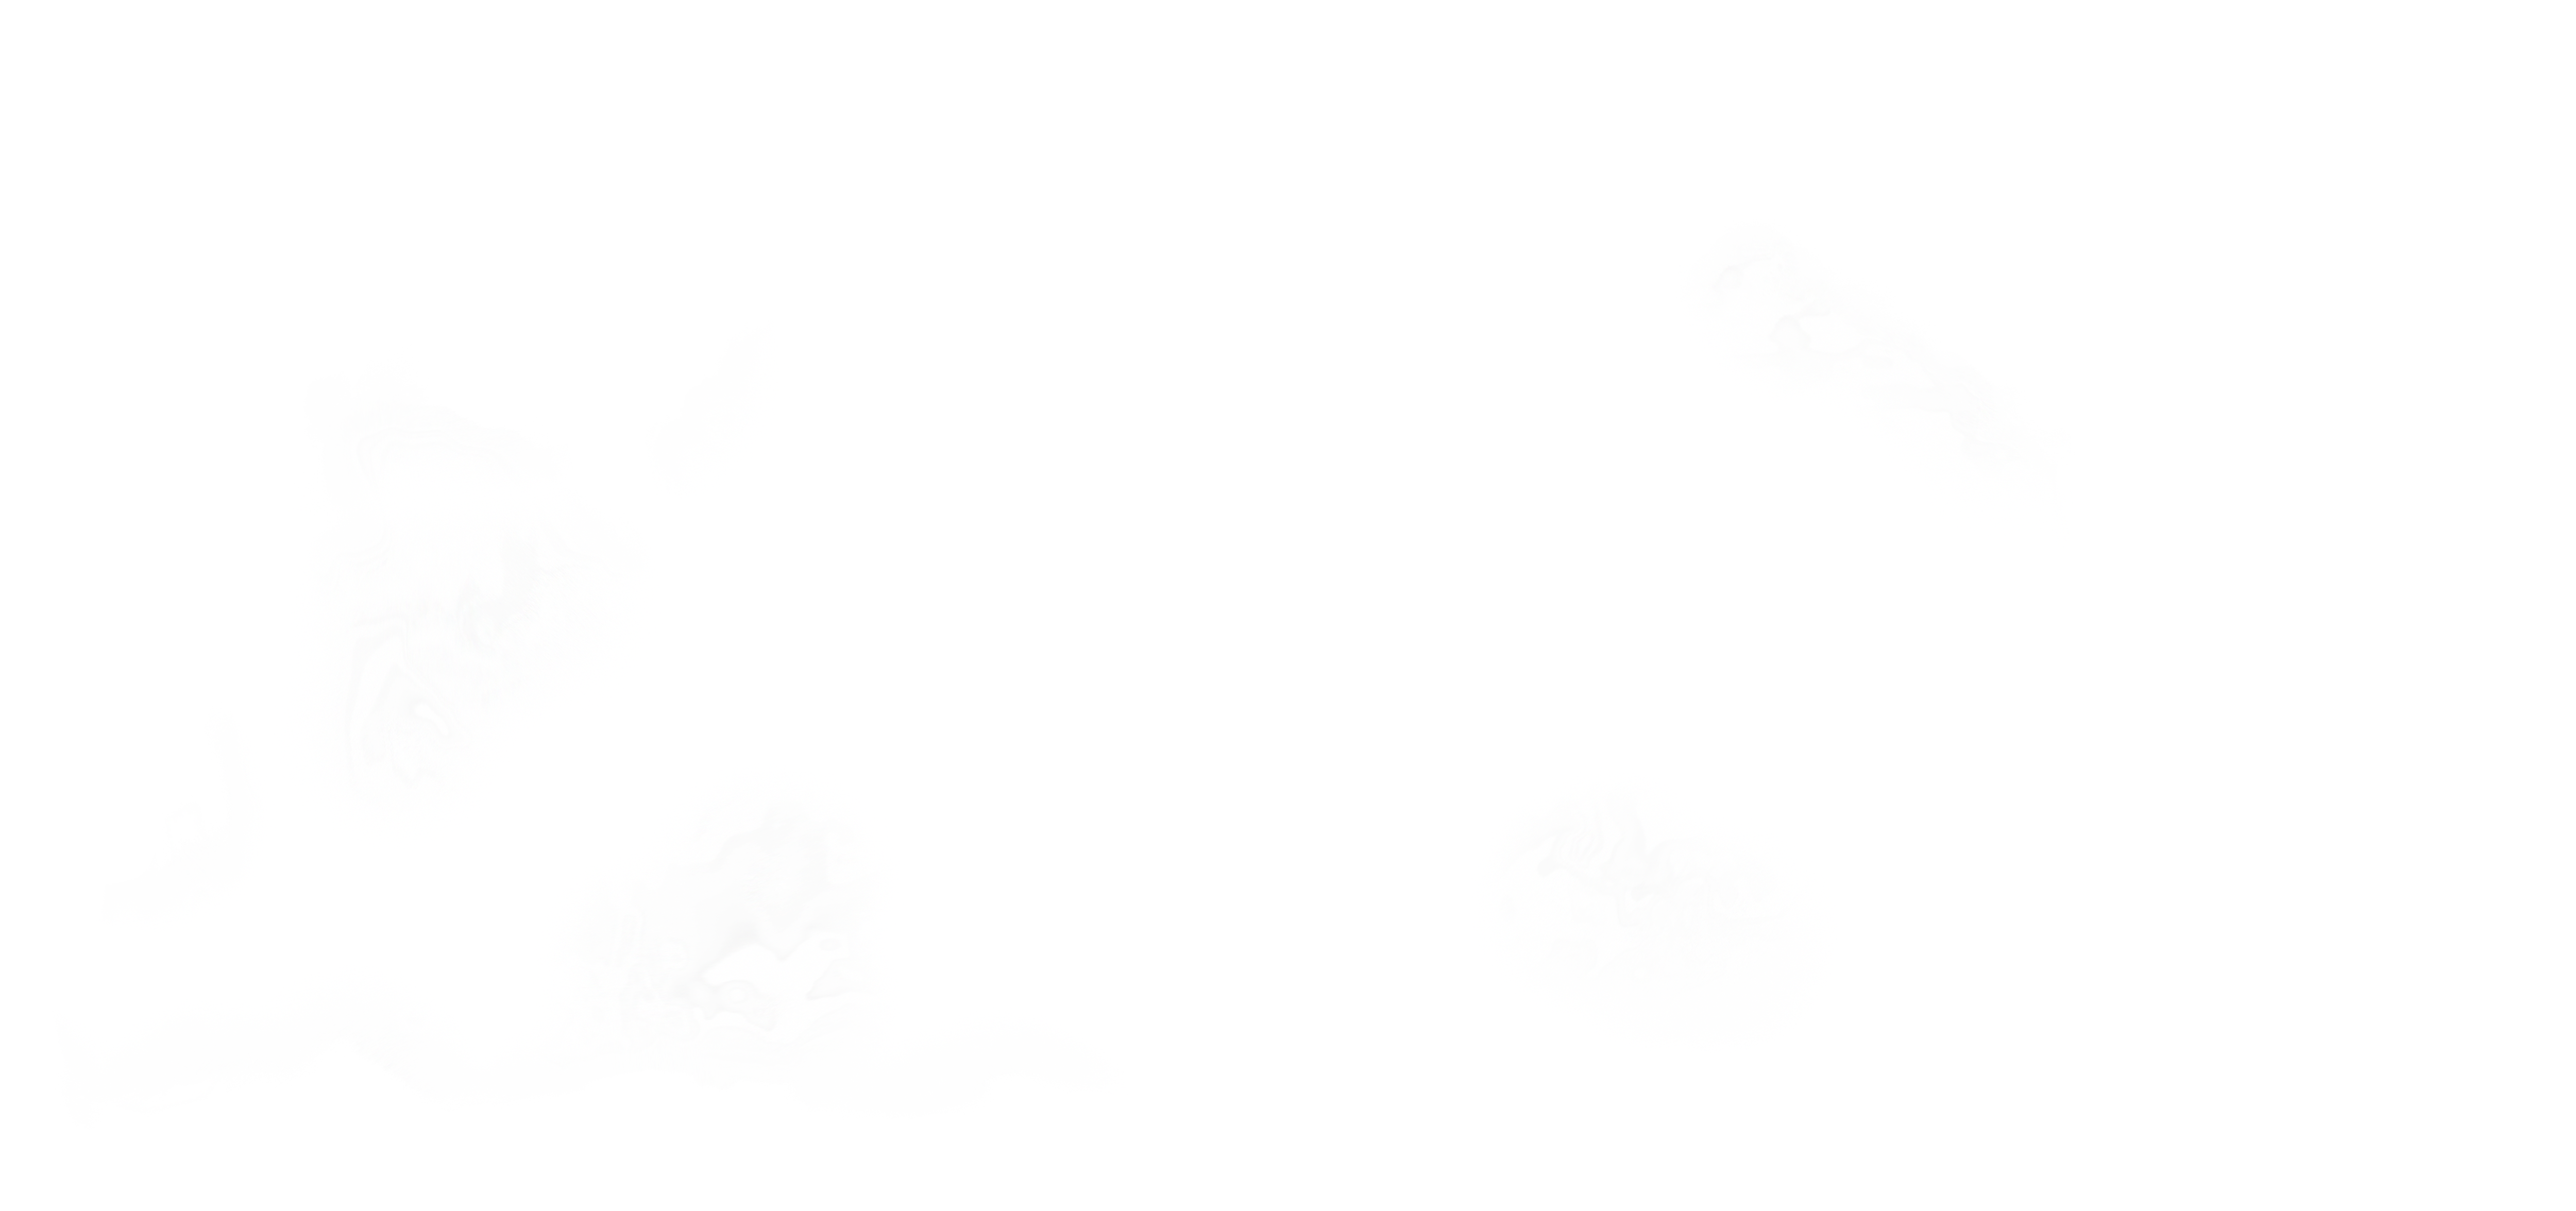 White Stratus Cloud PNG Clipart.